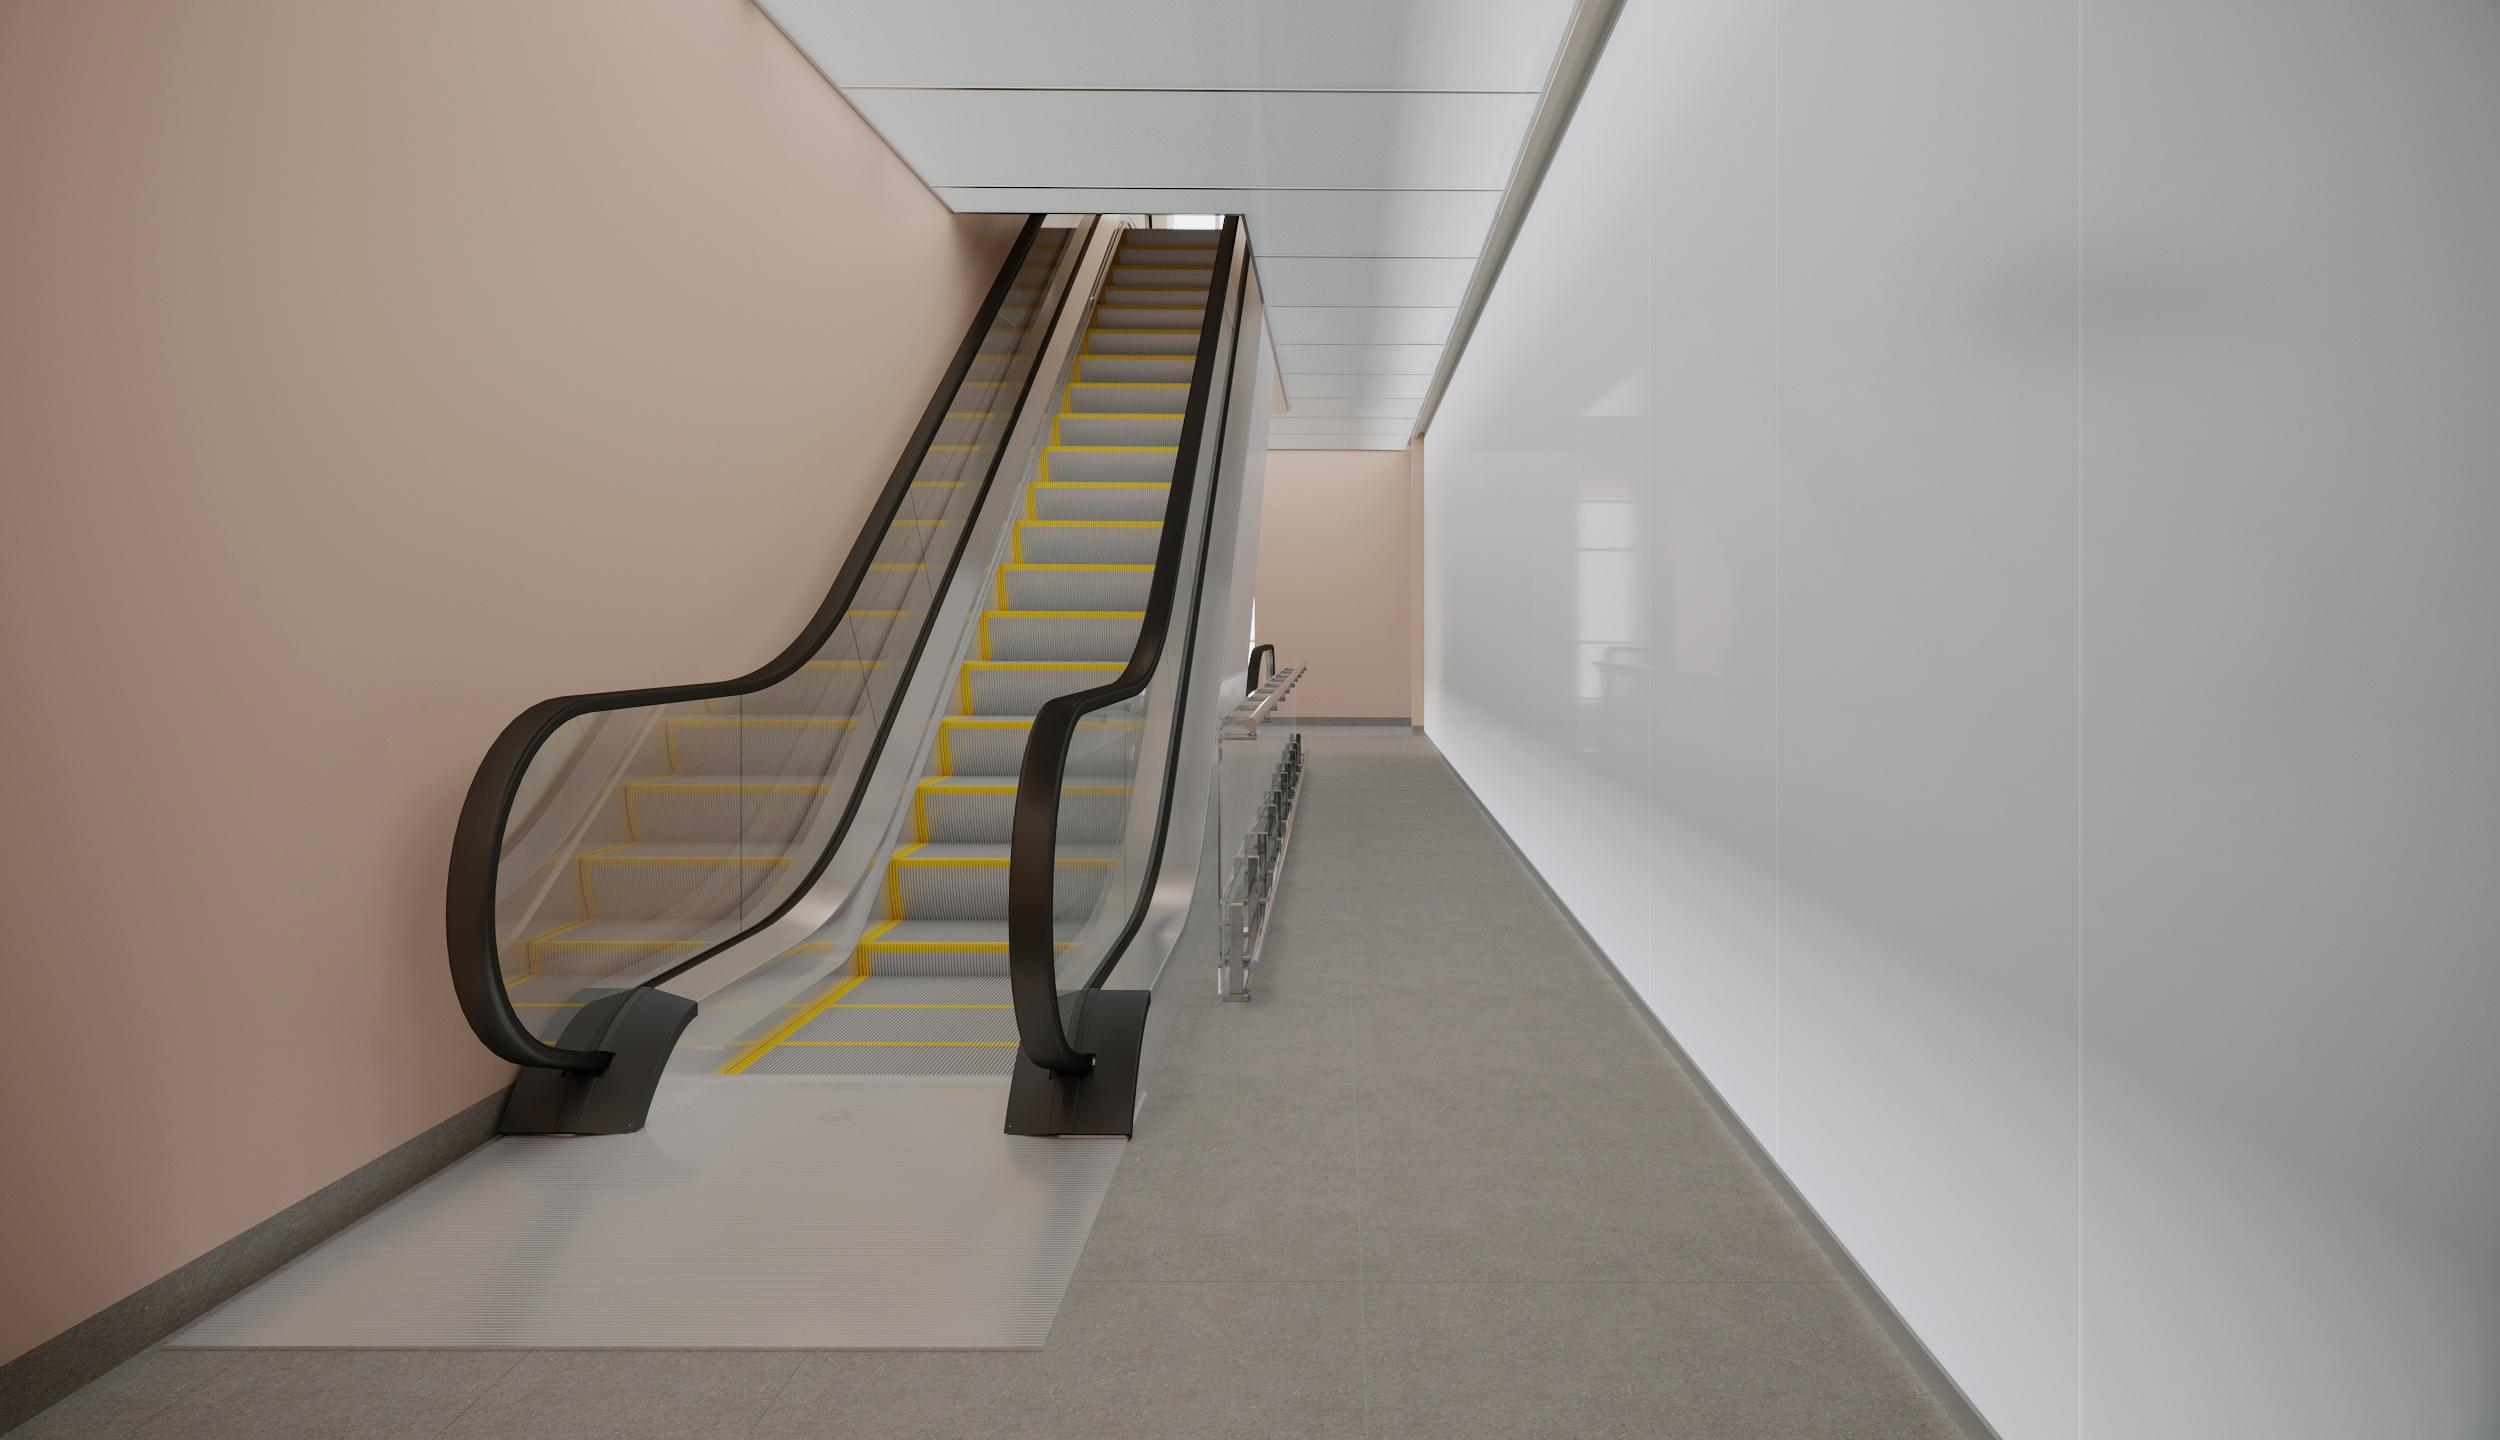 Hall - cosmethology - 4th floor